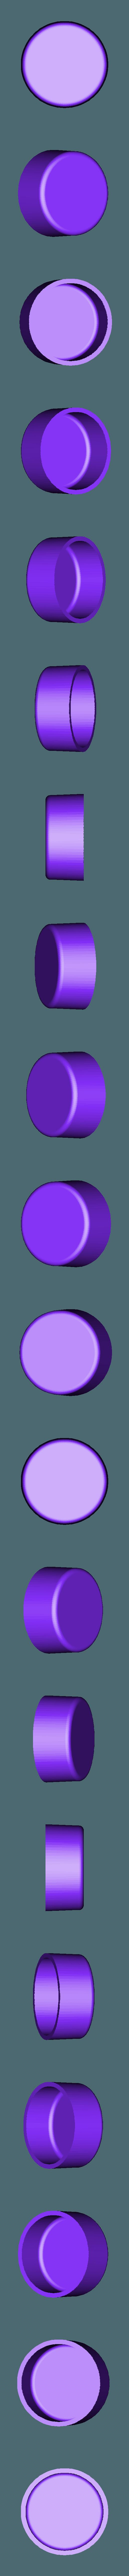 FEPbuttonResin.stl Download free STL file Anycubic Photon FEP replacment Calibration Cap / Button • 3D printable model, BigMrTong